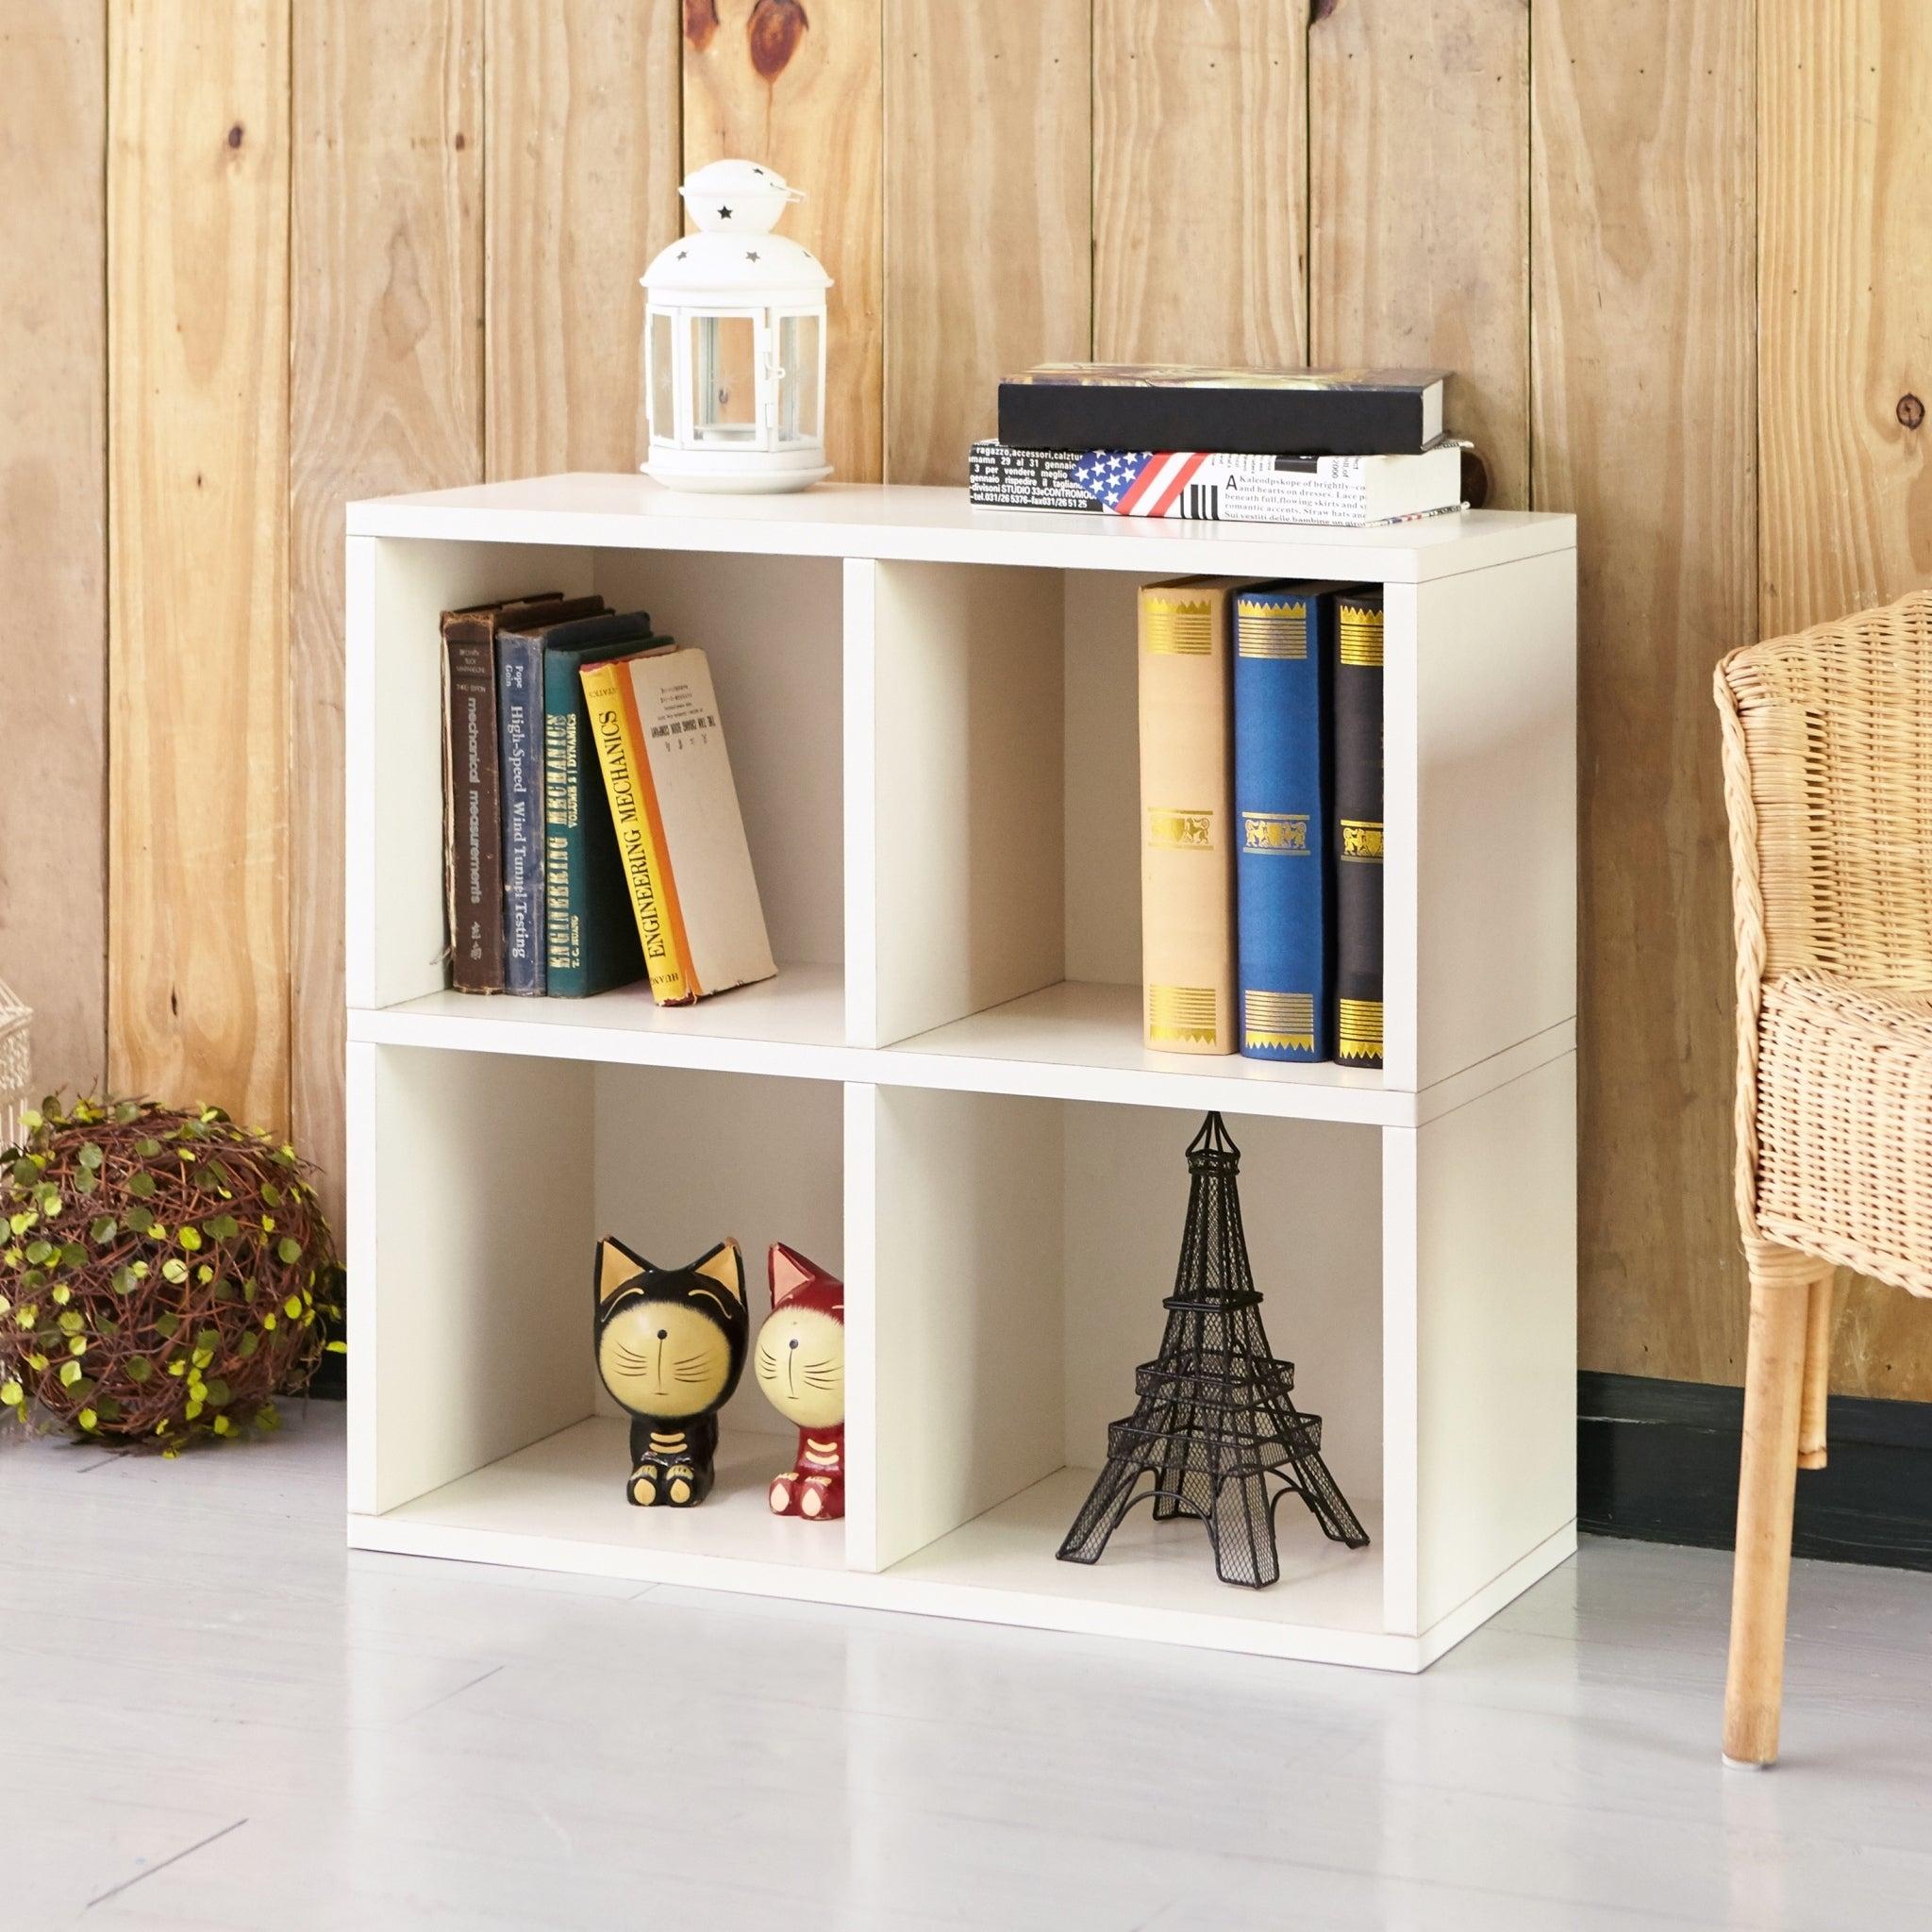 Clover Eco 4 Cubby Bookcase Storage White Lifetime Guarantee